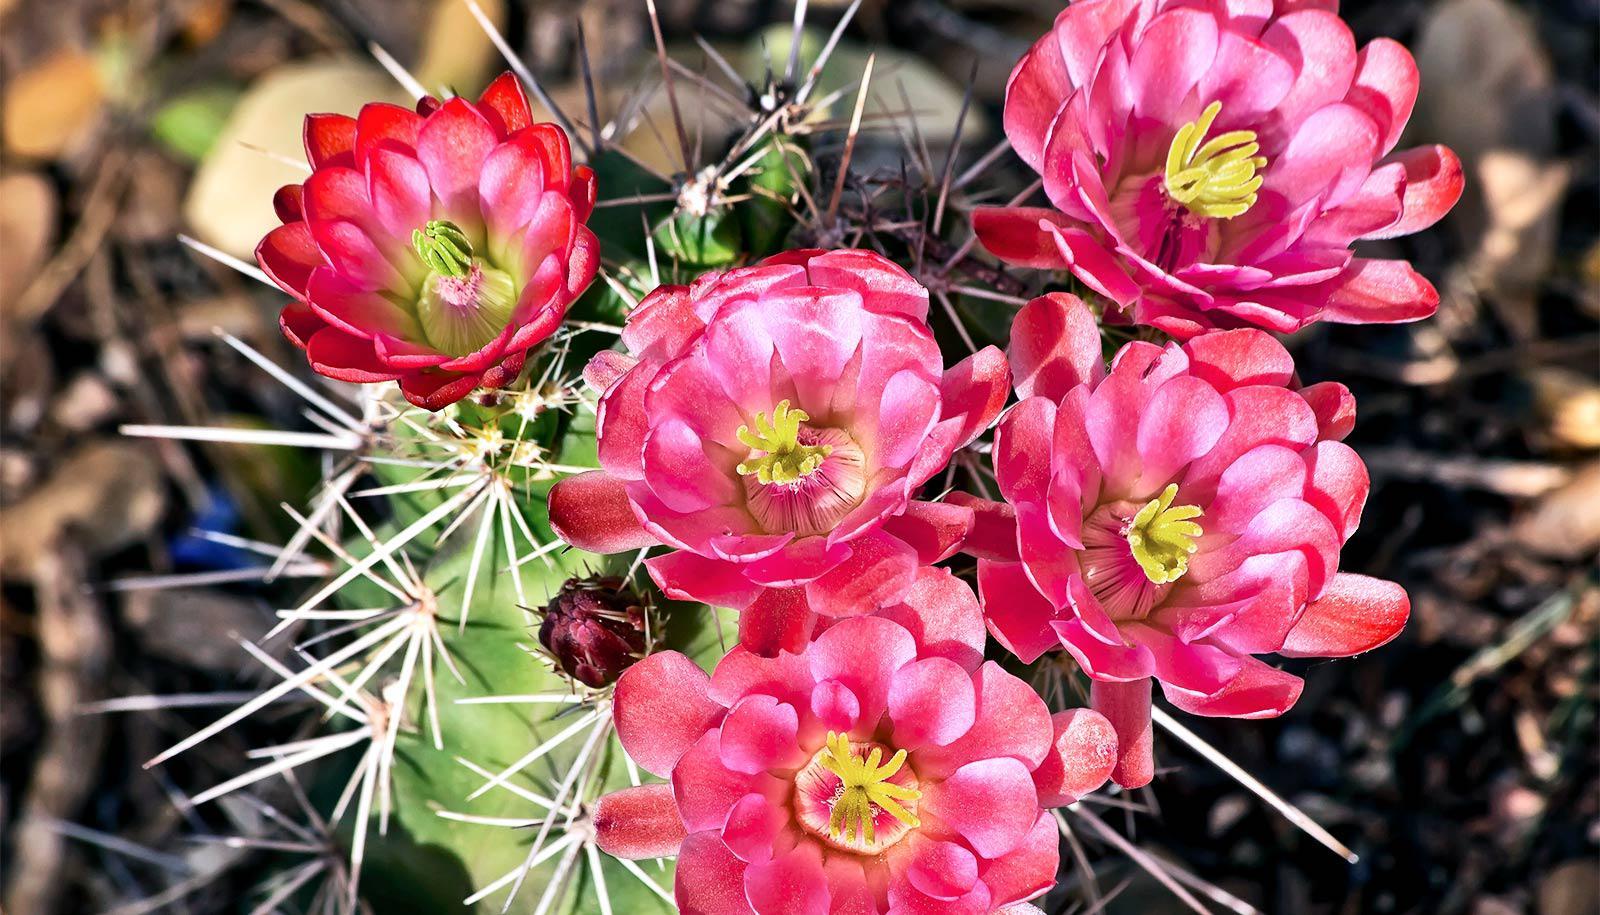 flowers on cactus